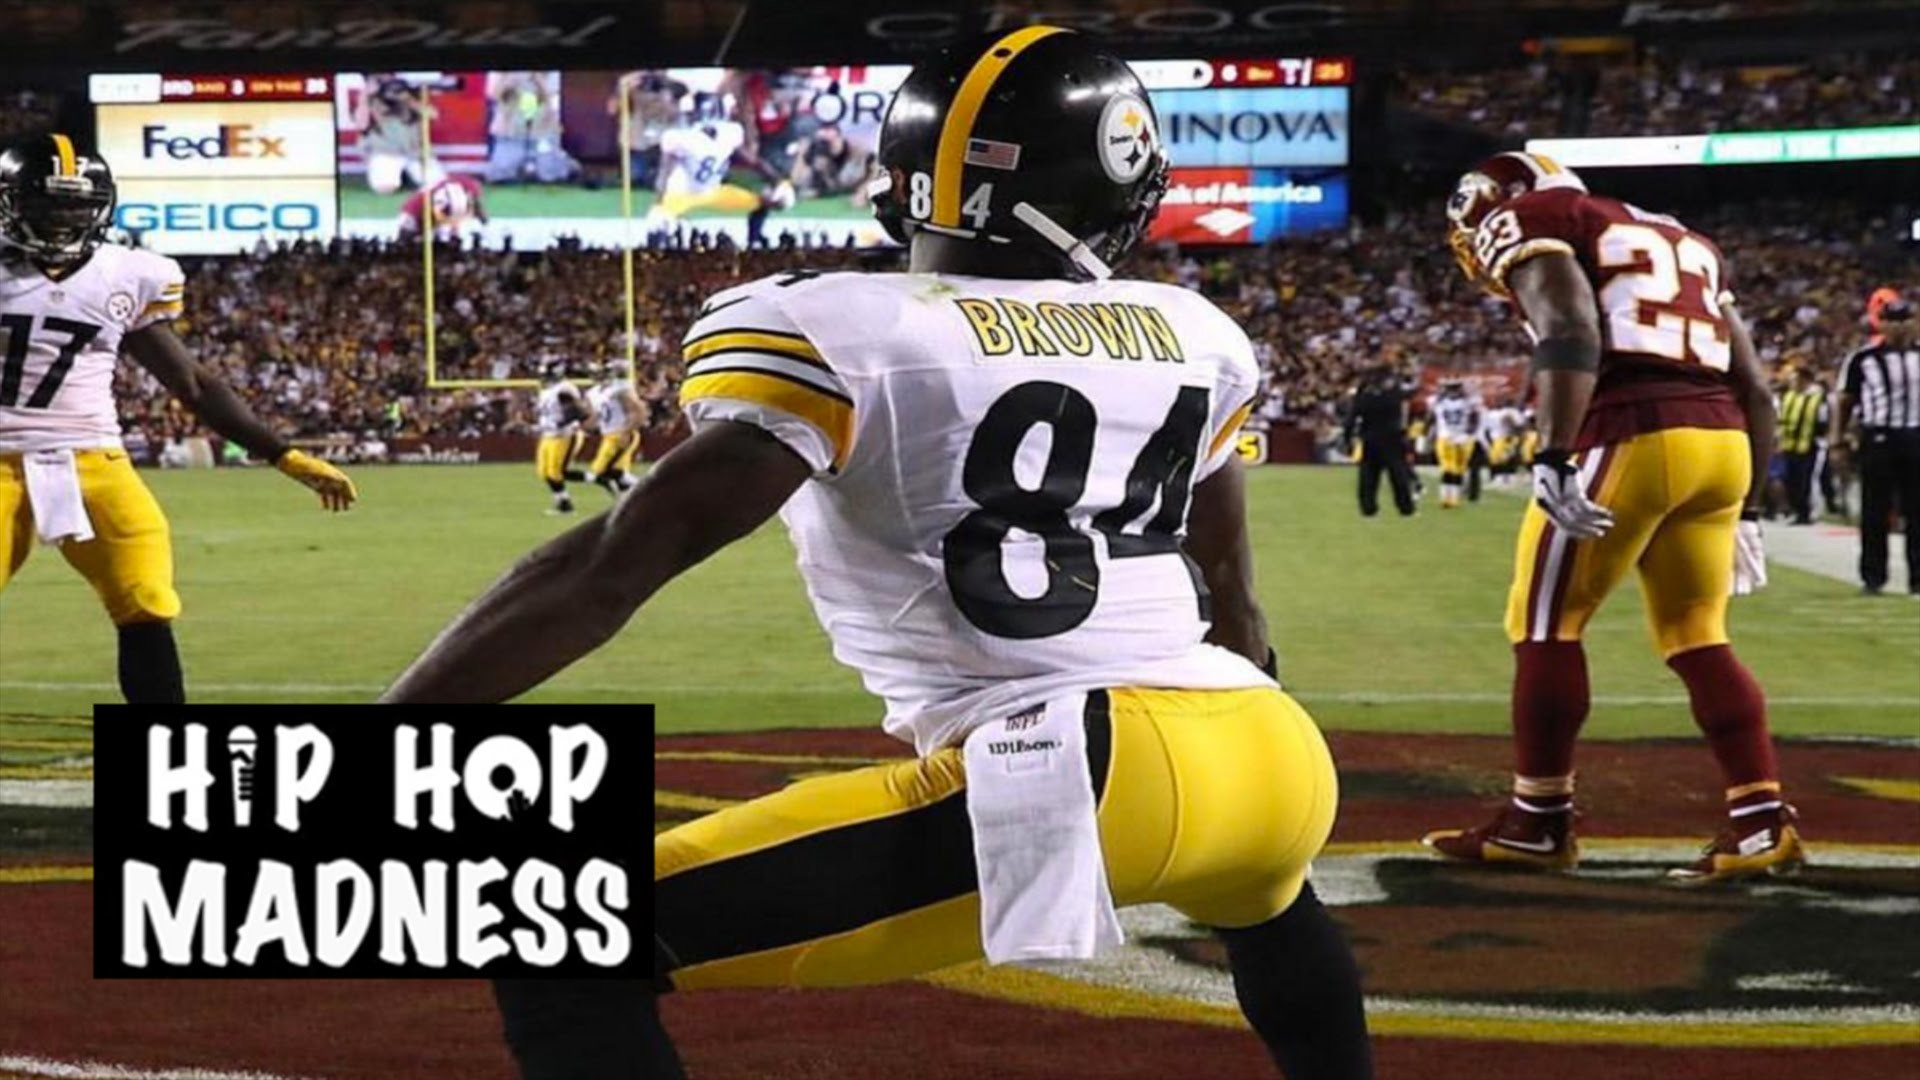 Antonio Brown Hits Redskins With Devastating TD Celebration (Twerking) and  Gets Penalized